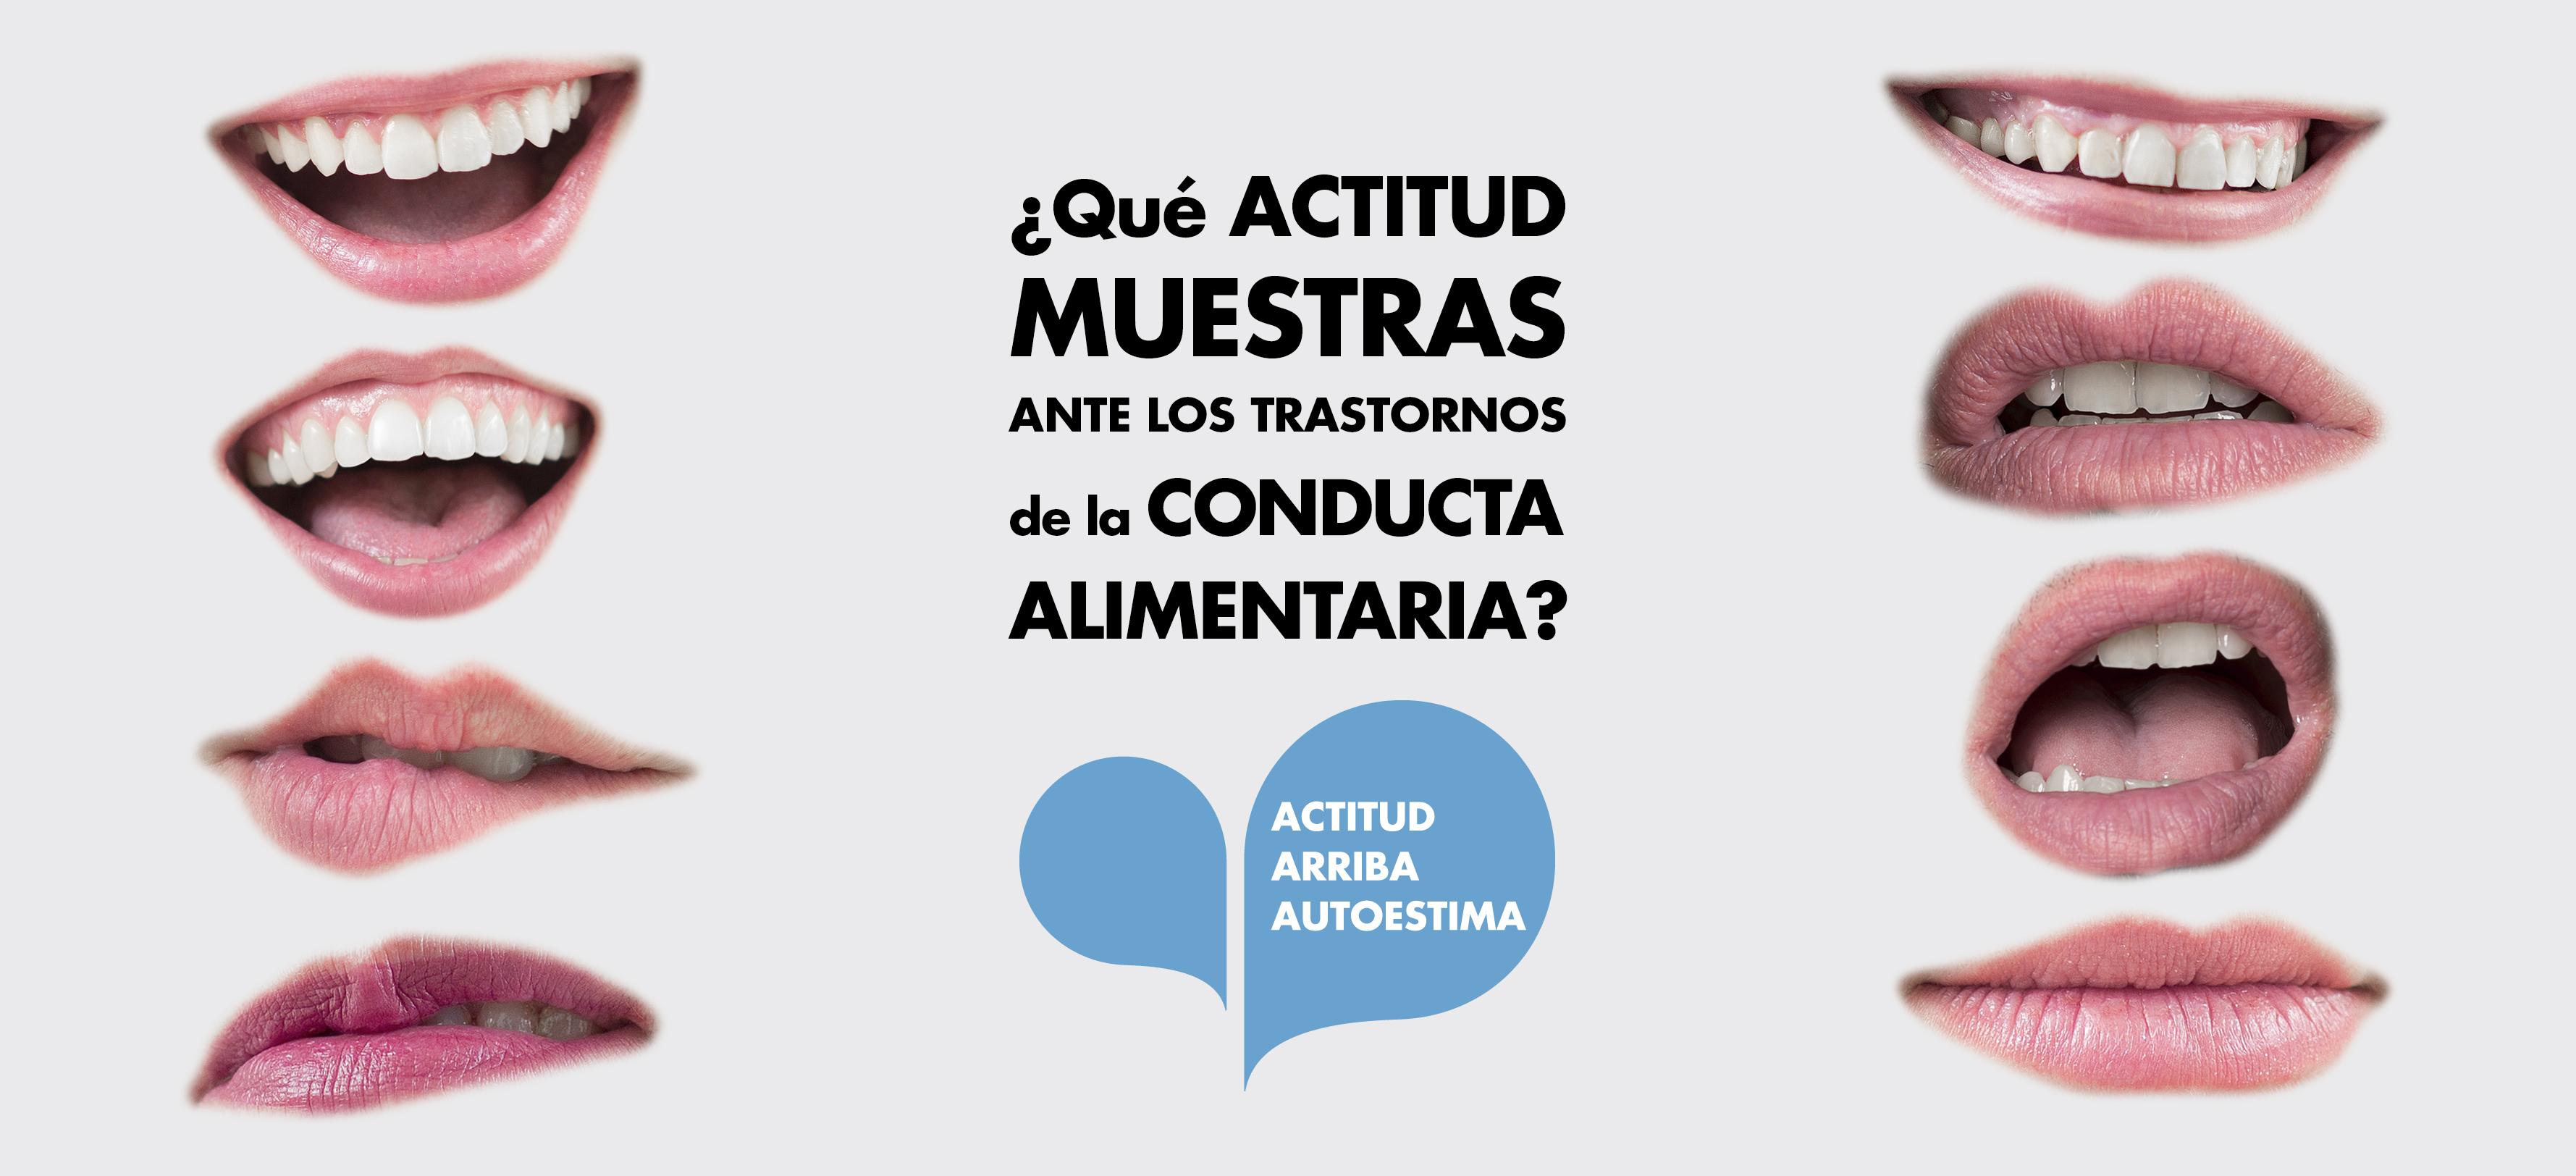 ACTITUD ARRIBA AUTOESTIMA